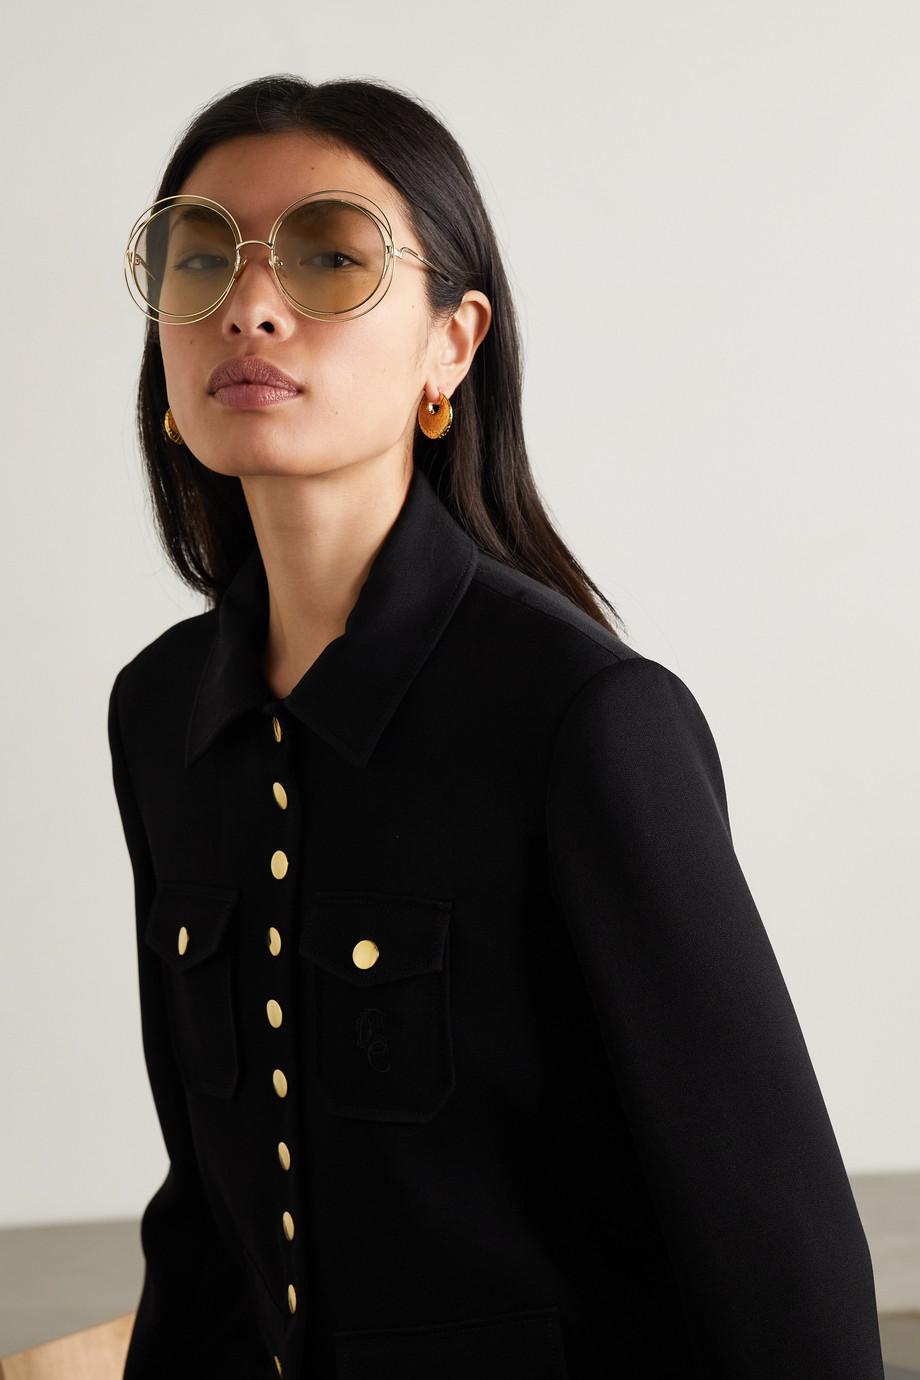 Chloé Carlina goldfarbene Oversized-Sonnenbrille mit rundem Rahmen